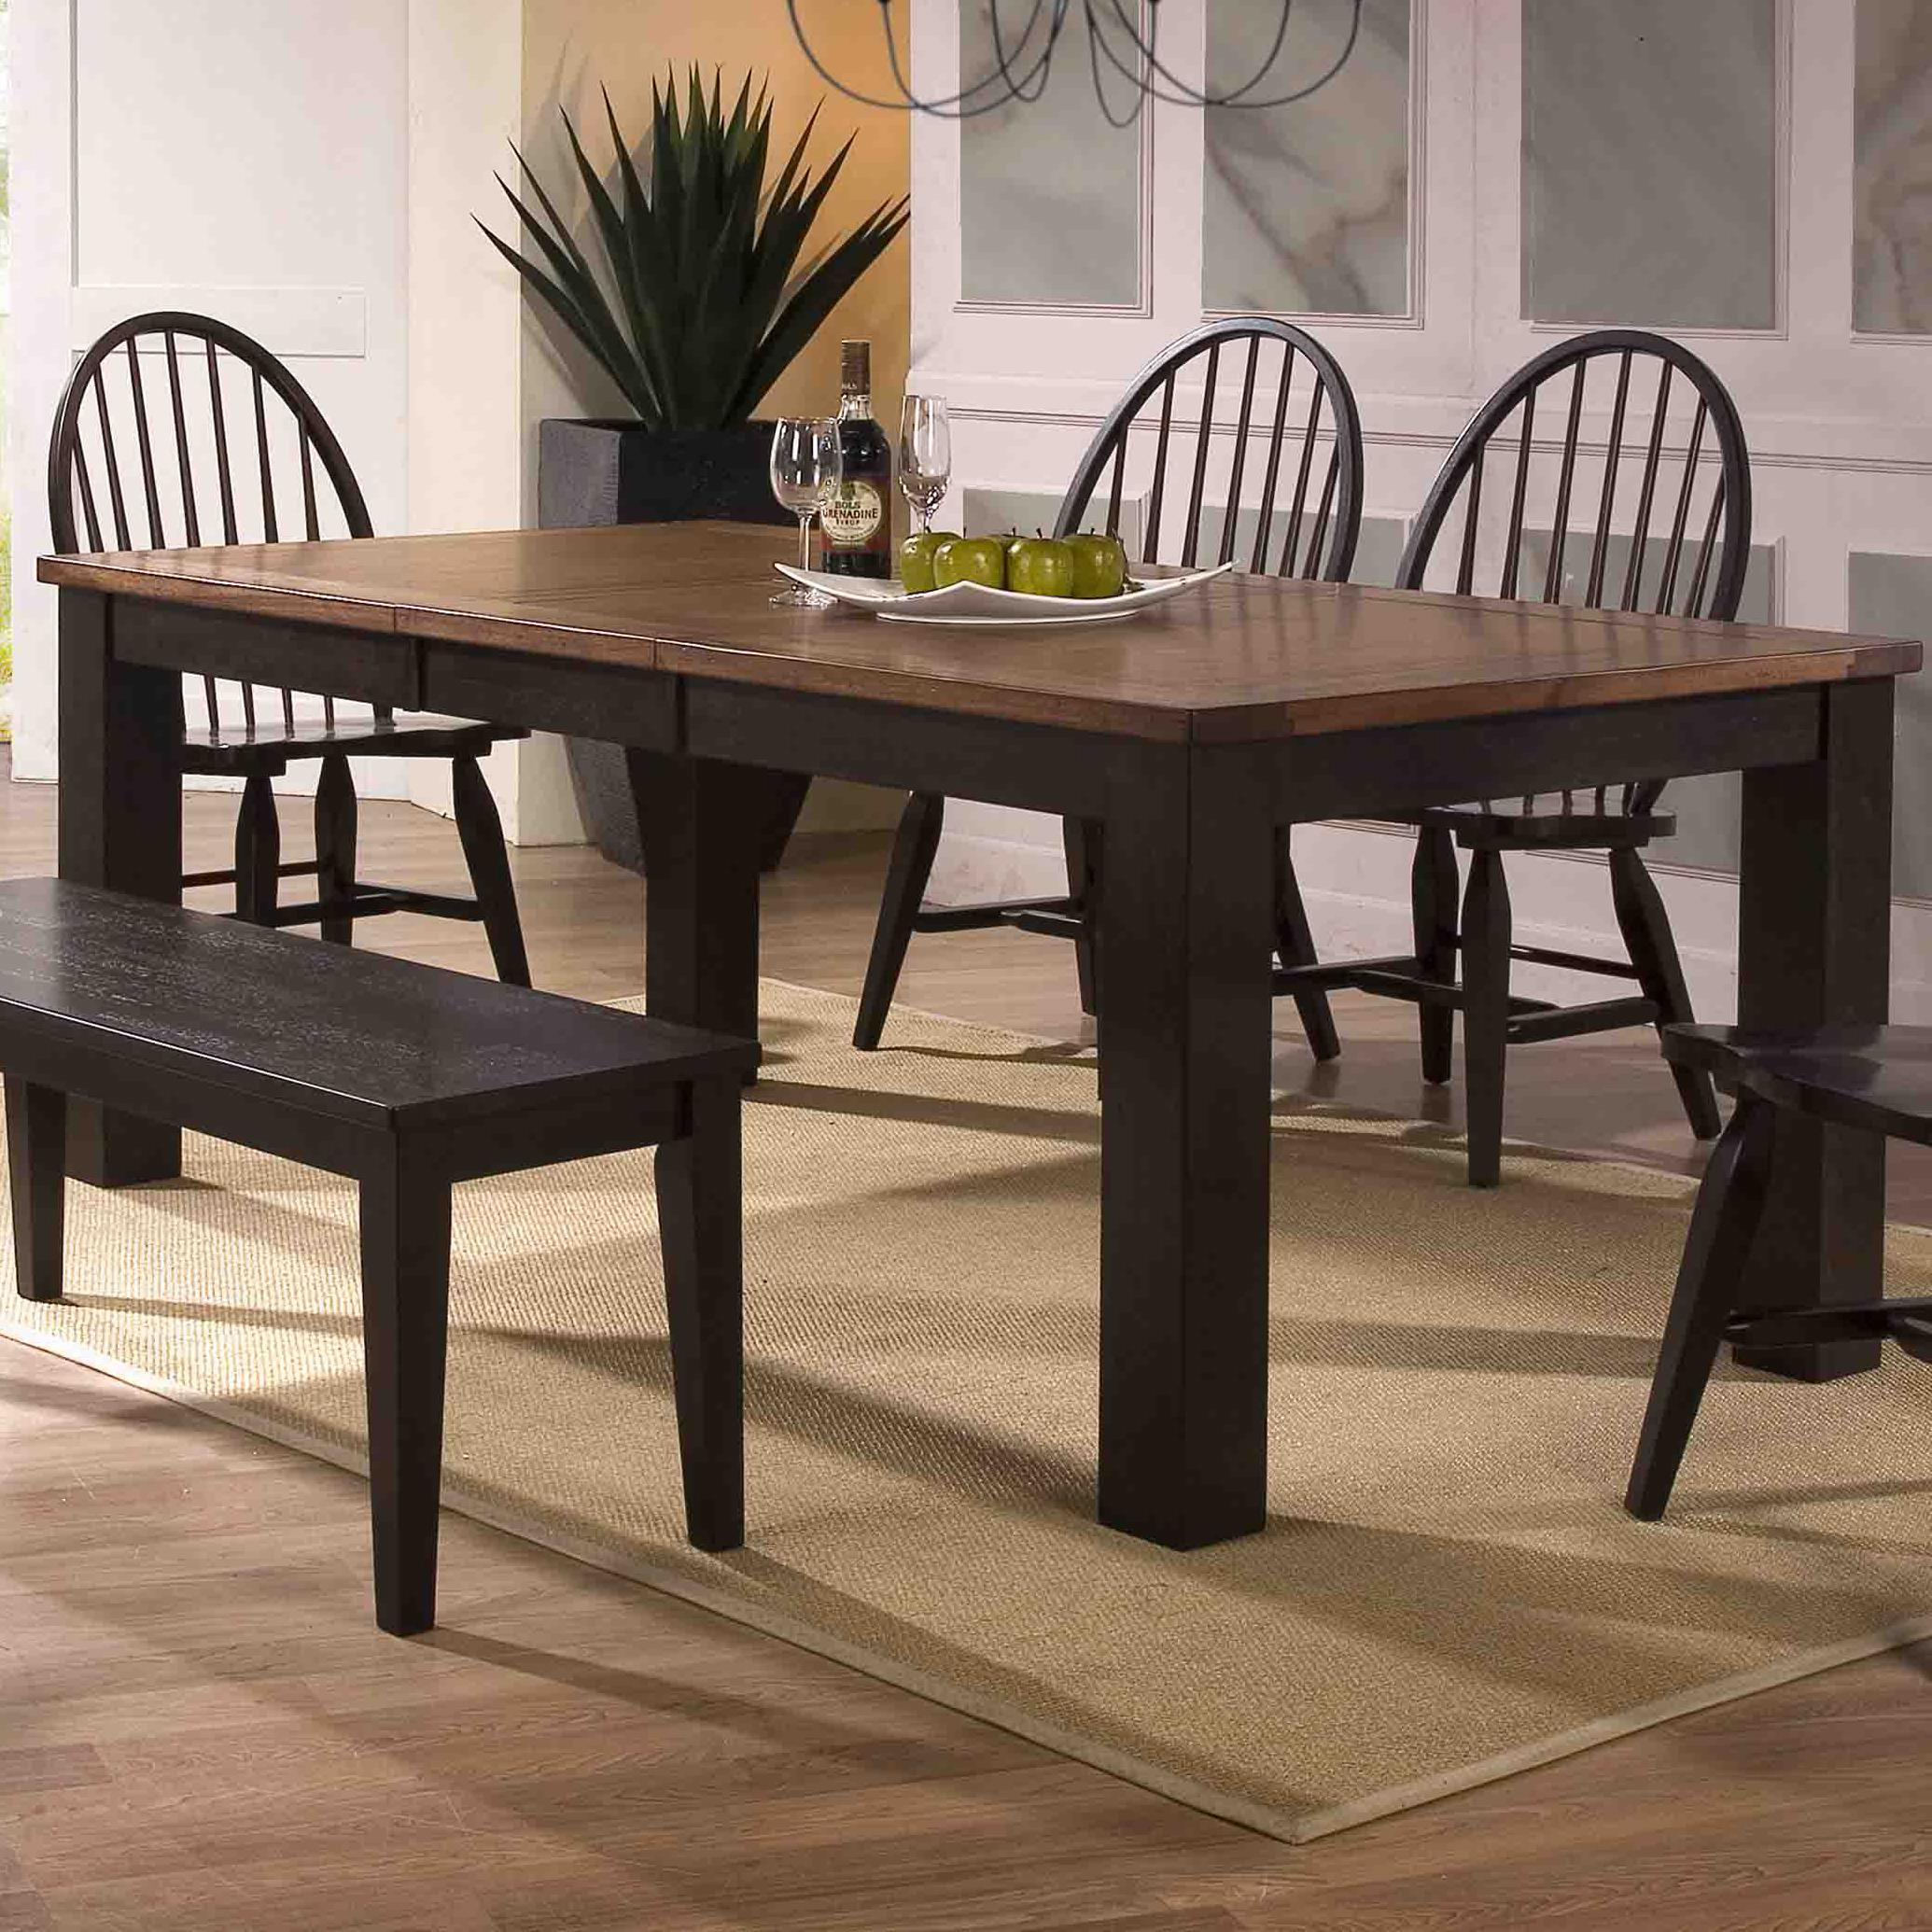 E.C.I. Furniture Acacia Leg Table - Item Number: 3073-00-T